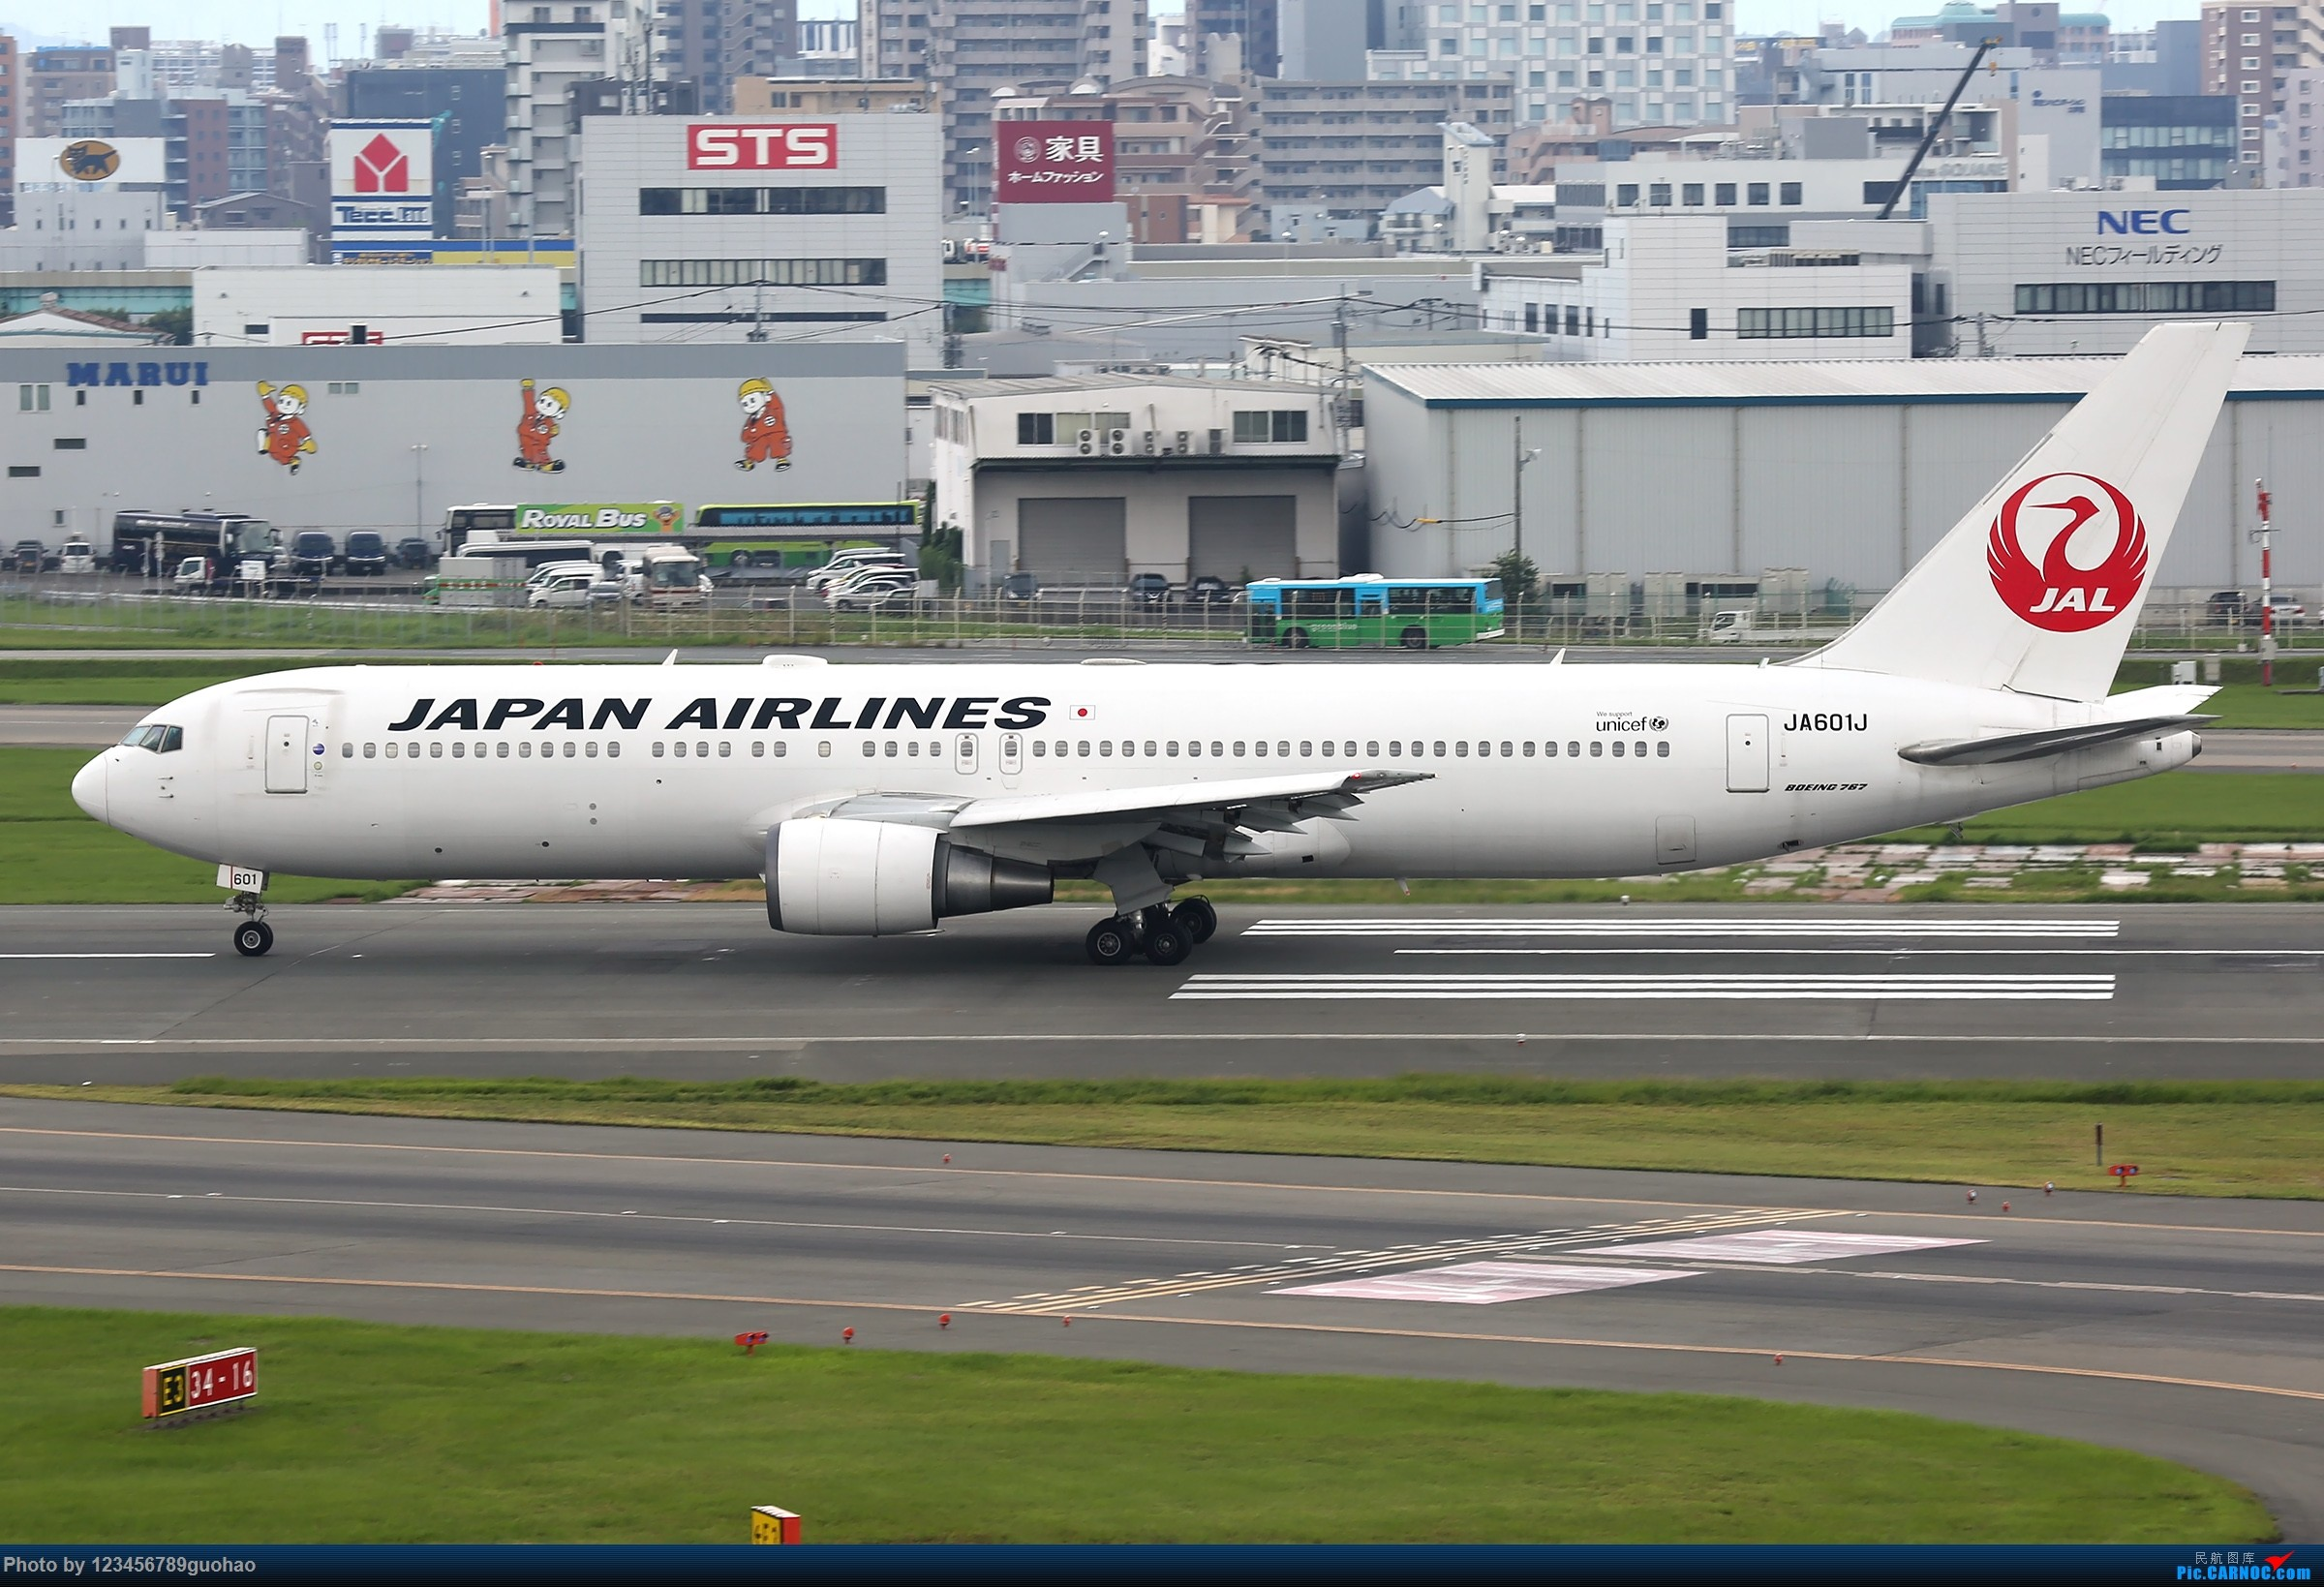 Re:[原创]日一组 BOEING 767-300 JA601J 日本福冈机场